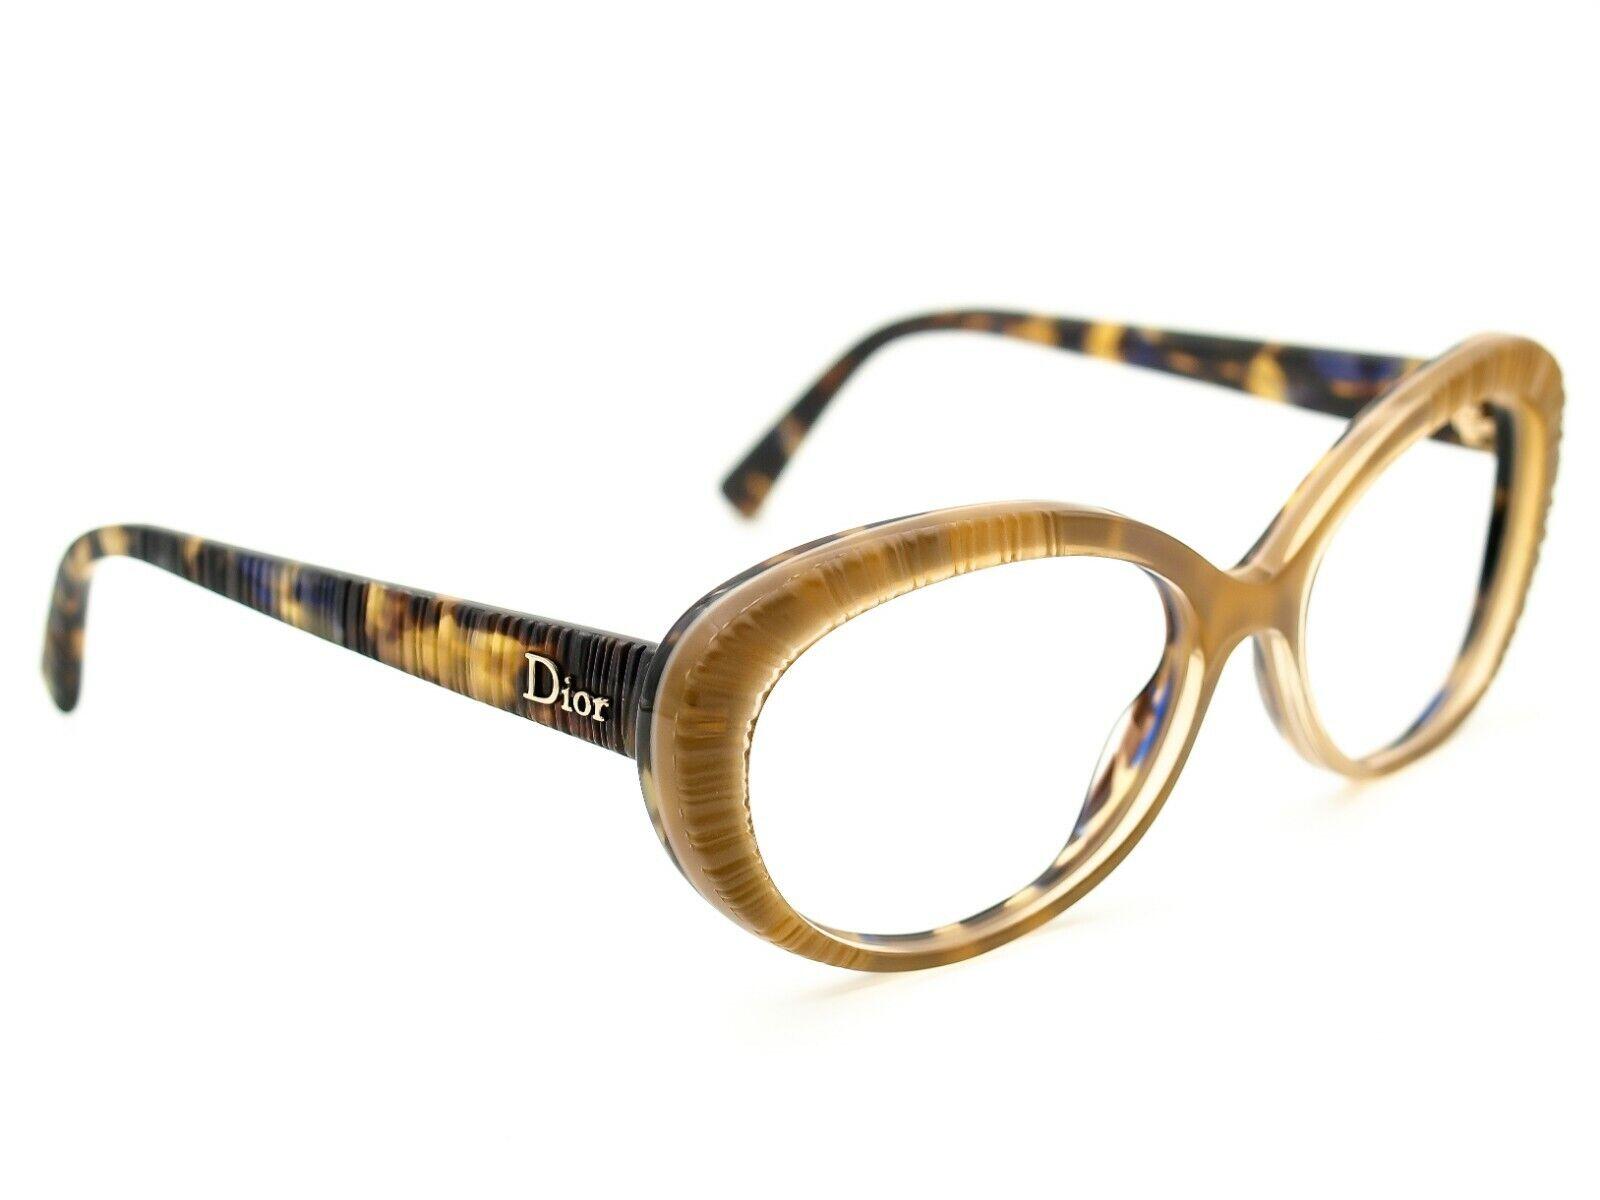 Dior Sunglasses FRAME ONLY Taffetas 3 2GSBA Honey/Tortoise Italy 56[]16 135